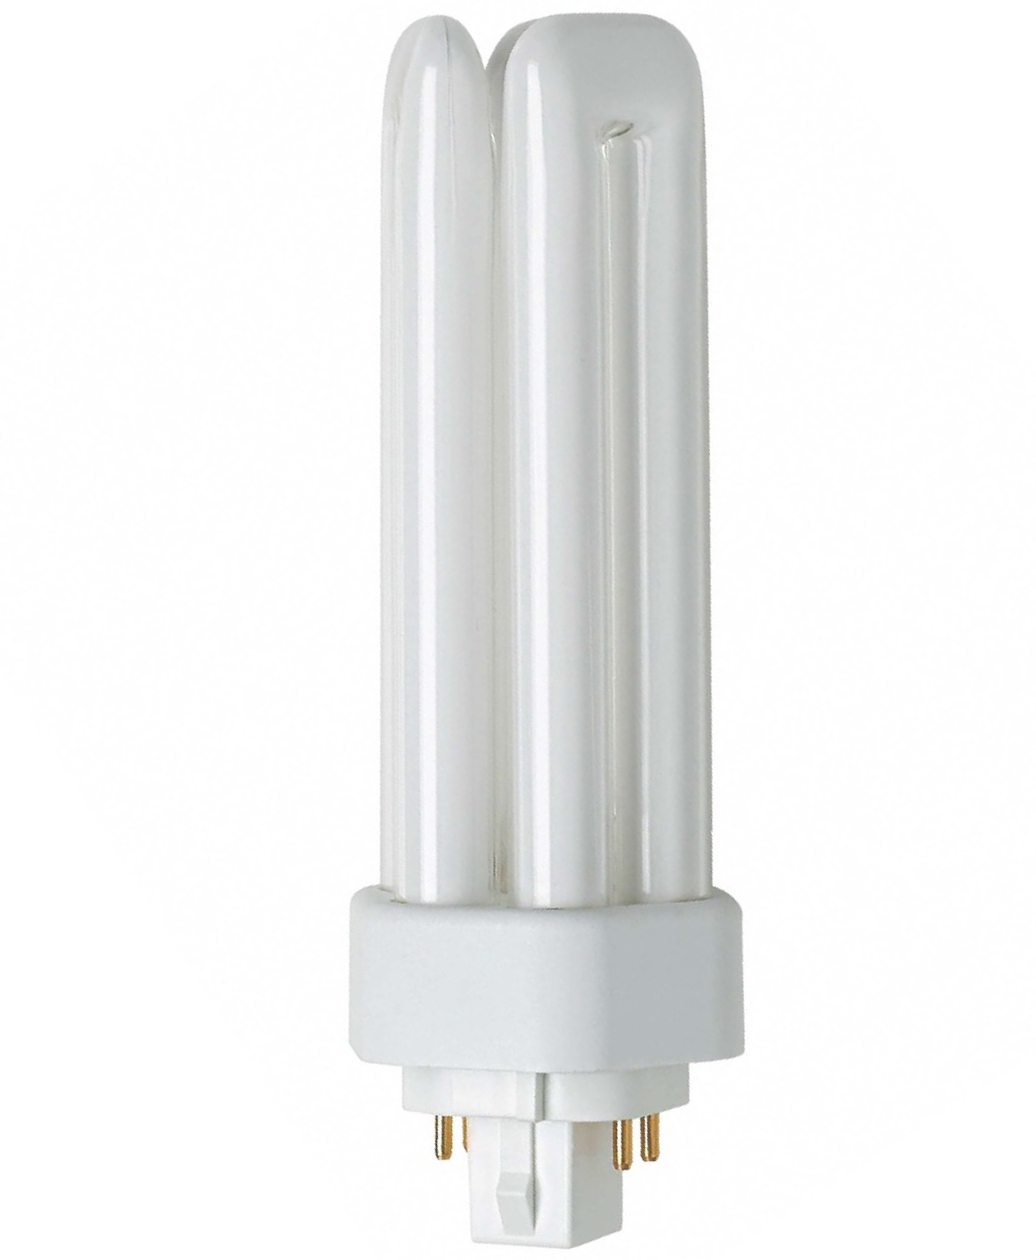 1 Stk TC-TEL 26W/830 Gx24Q-3, Kompaktleuchtstofflampe LI5V342306